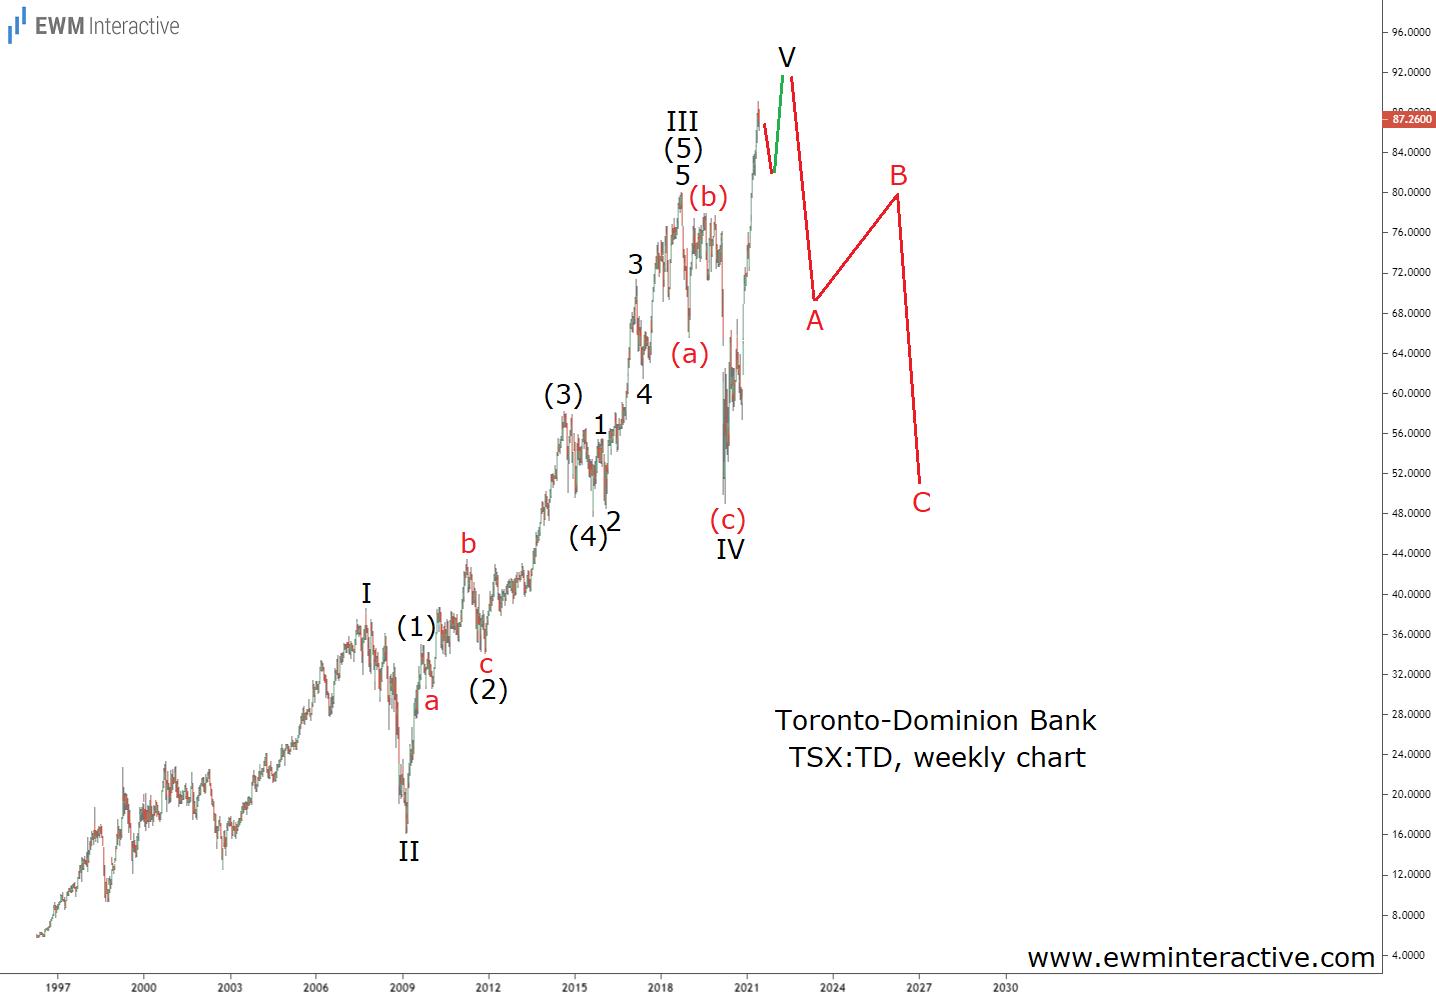 Toronto-Dominion Bank Elliott Wave chart